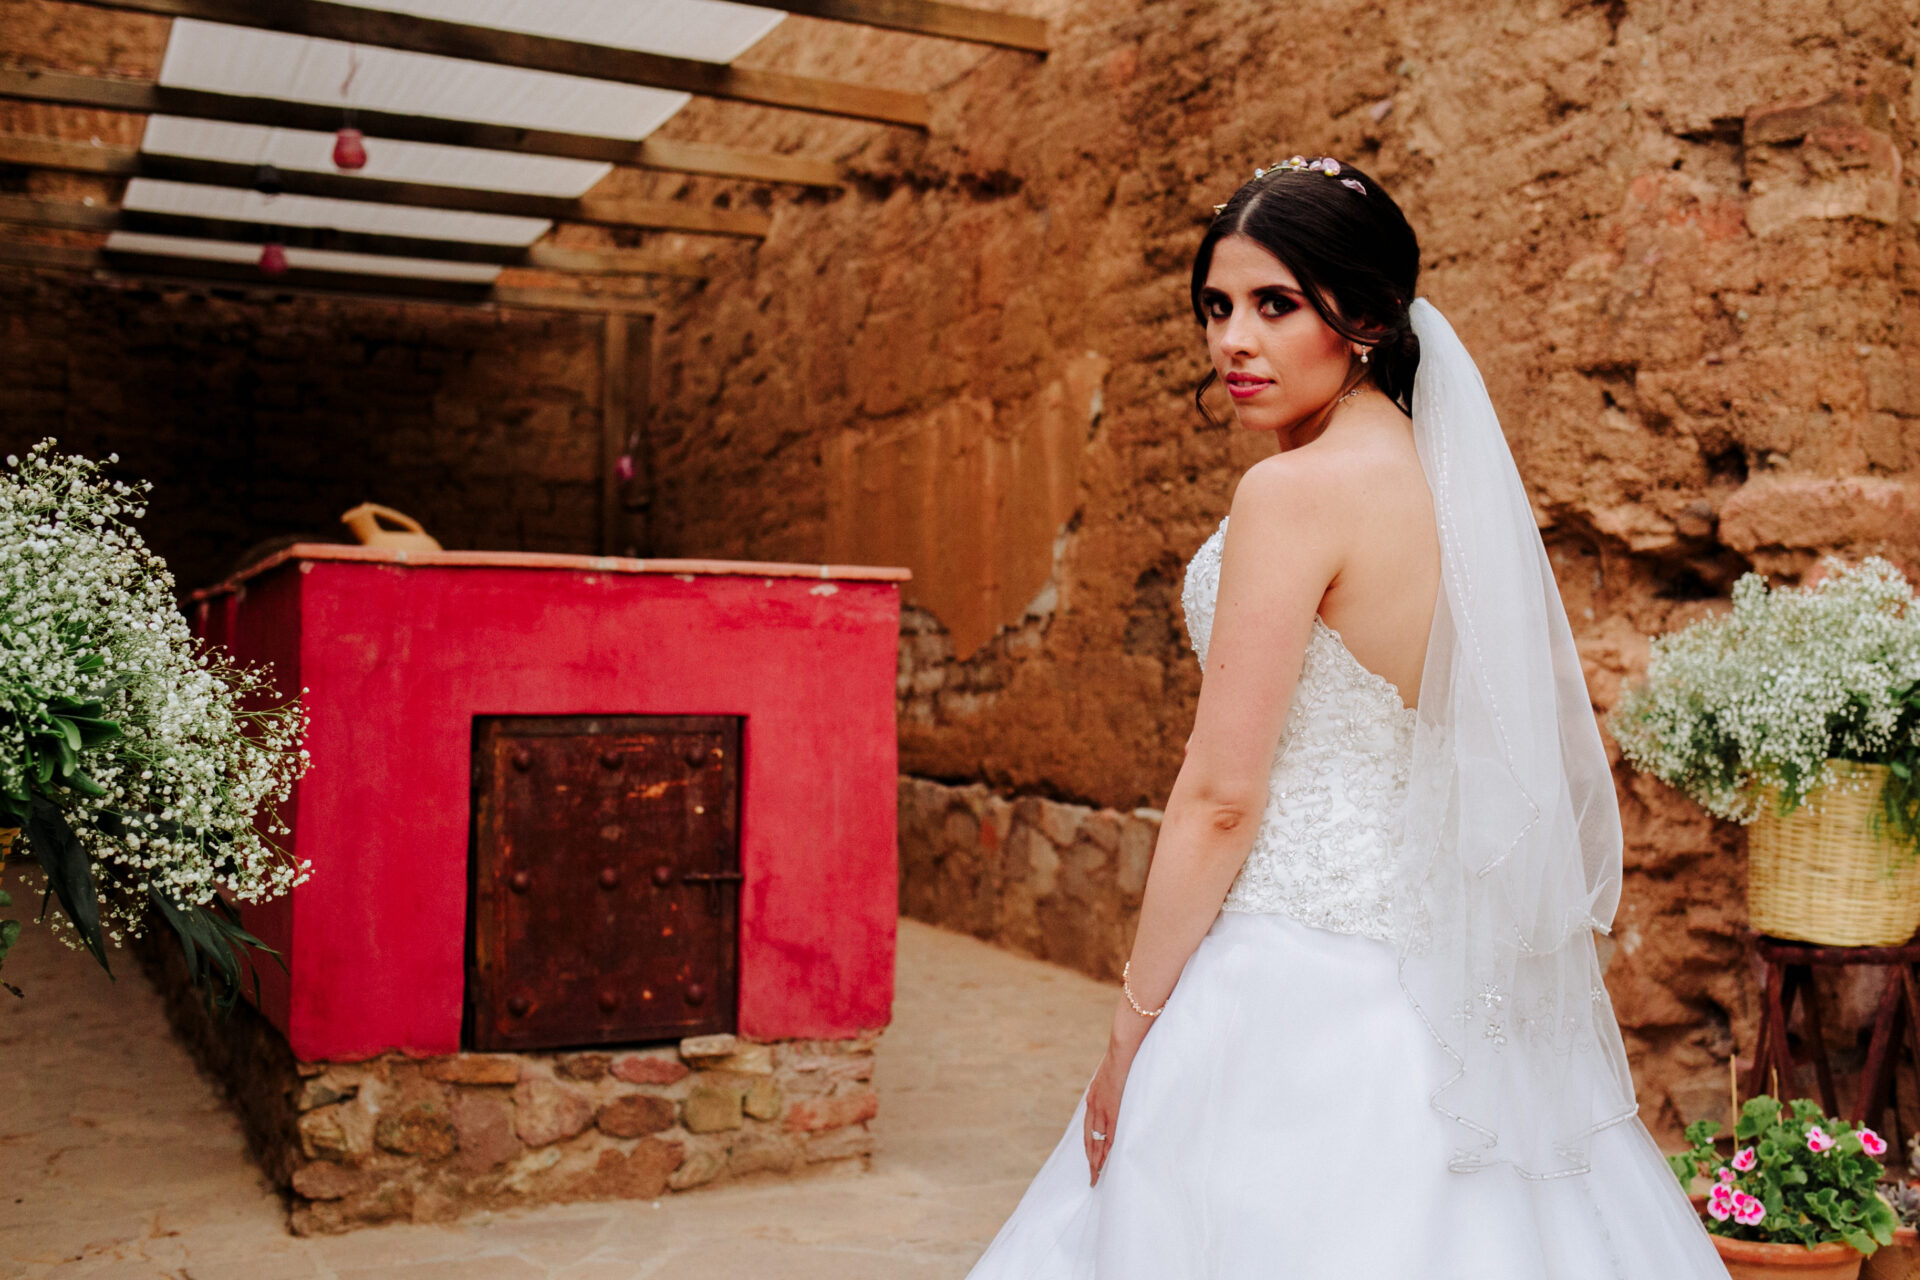 javier_noriega_fotografo_bodas_exhacienda_las_mercedes_zacatecas_wedding_photographer24a